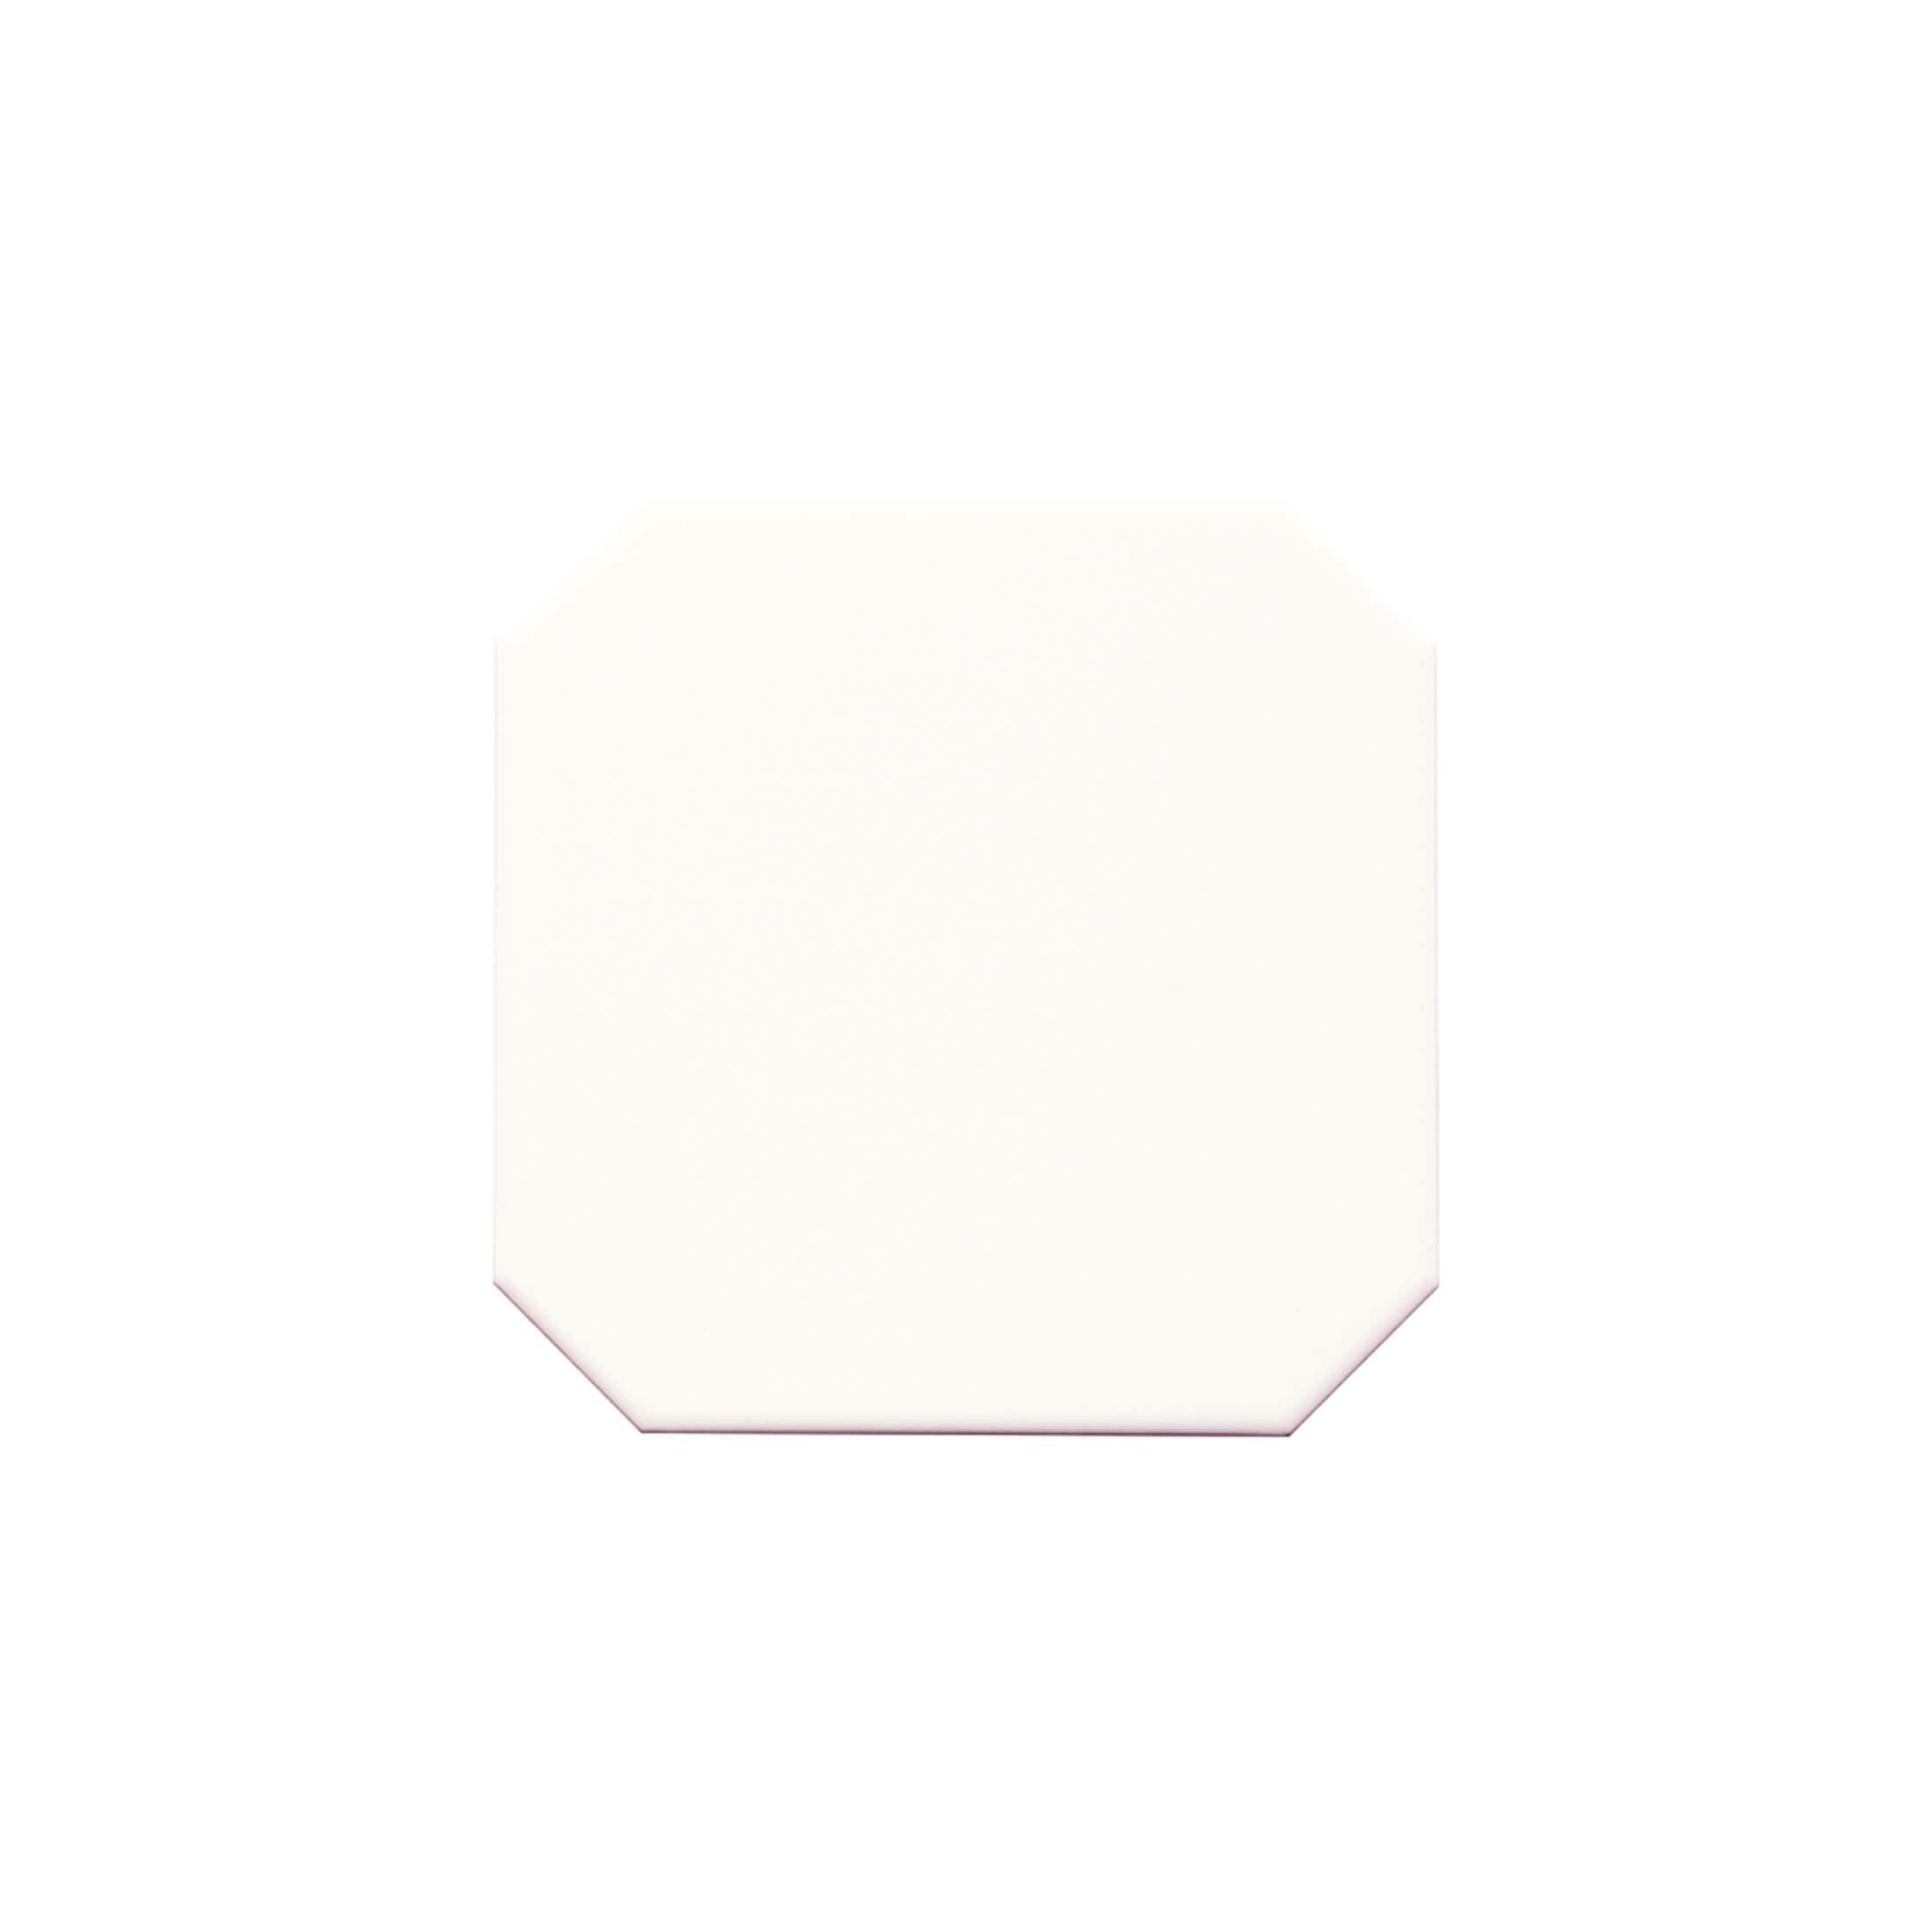 ADPV9002 - PAVIMENTO BISCUIT - 15 cm X 15 cm